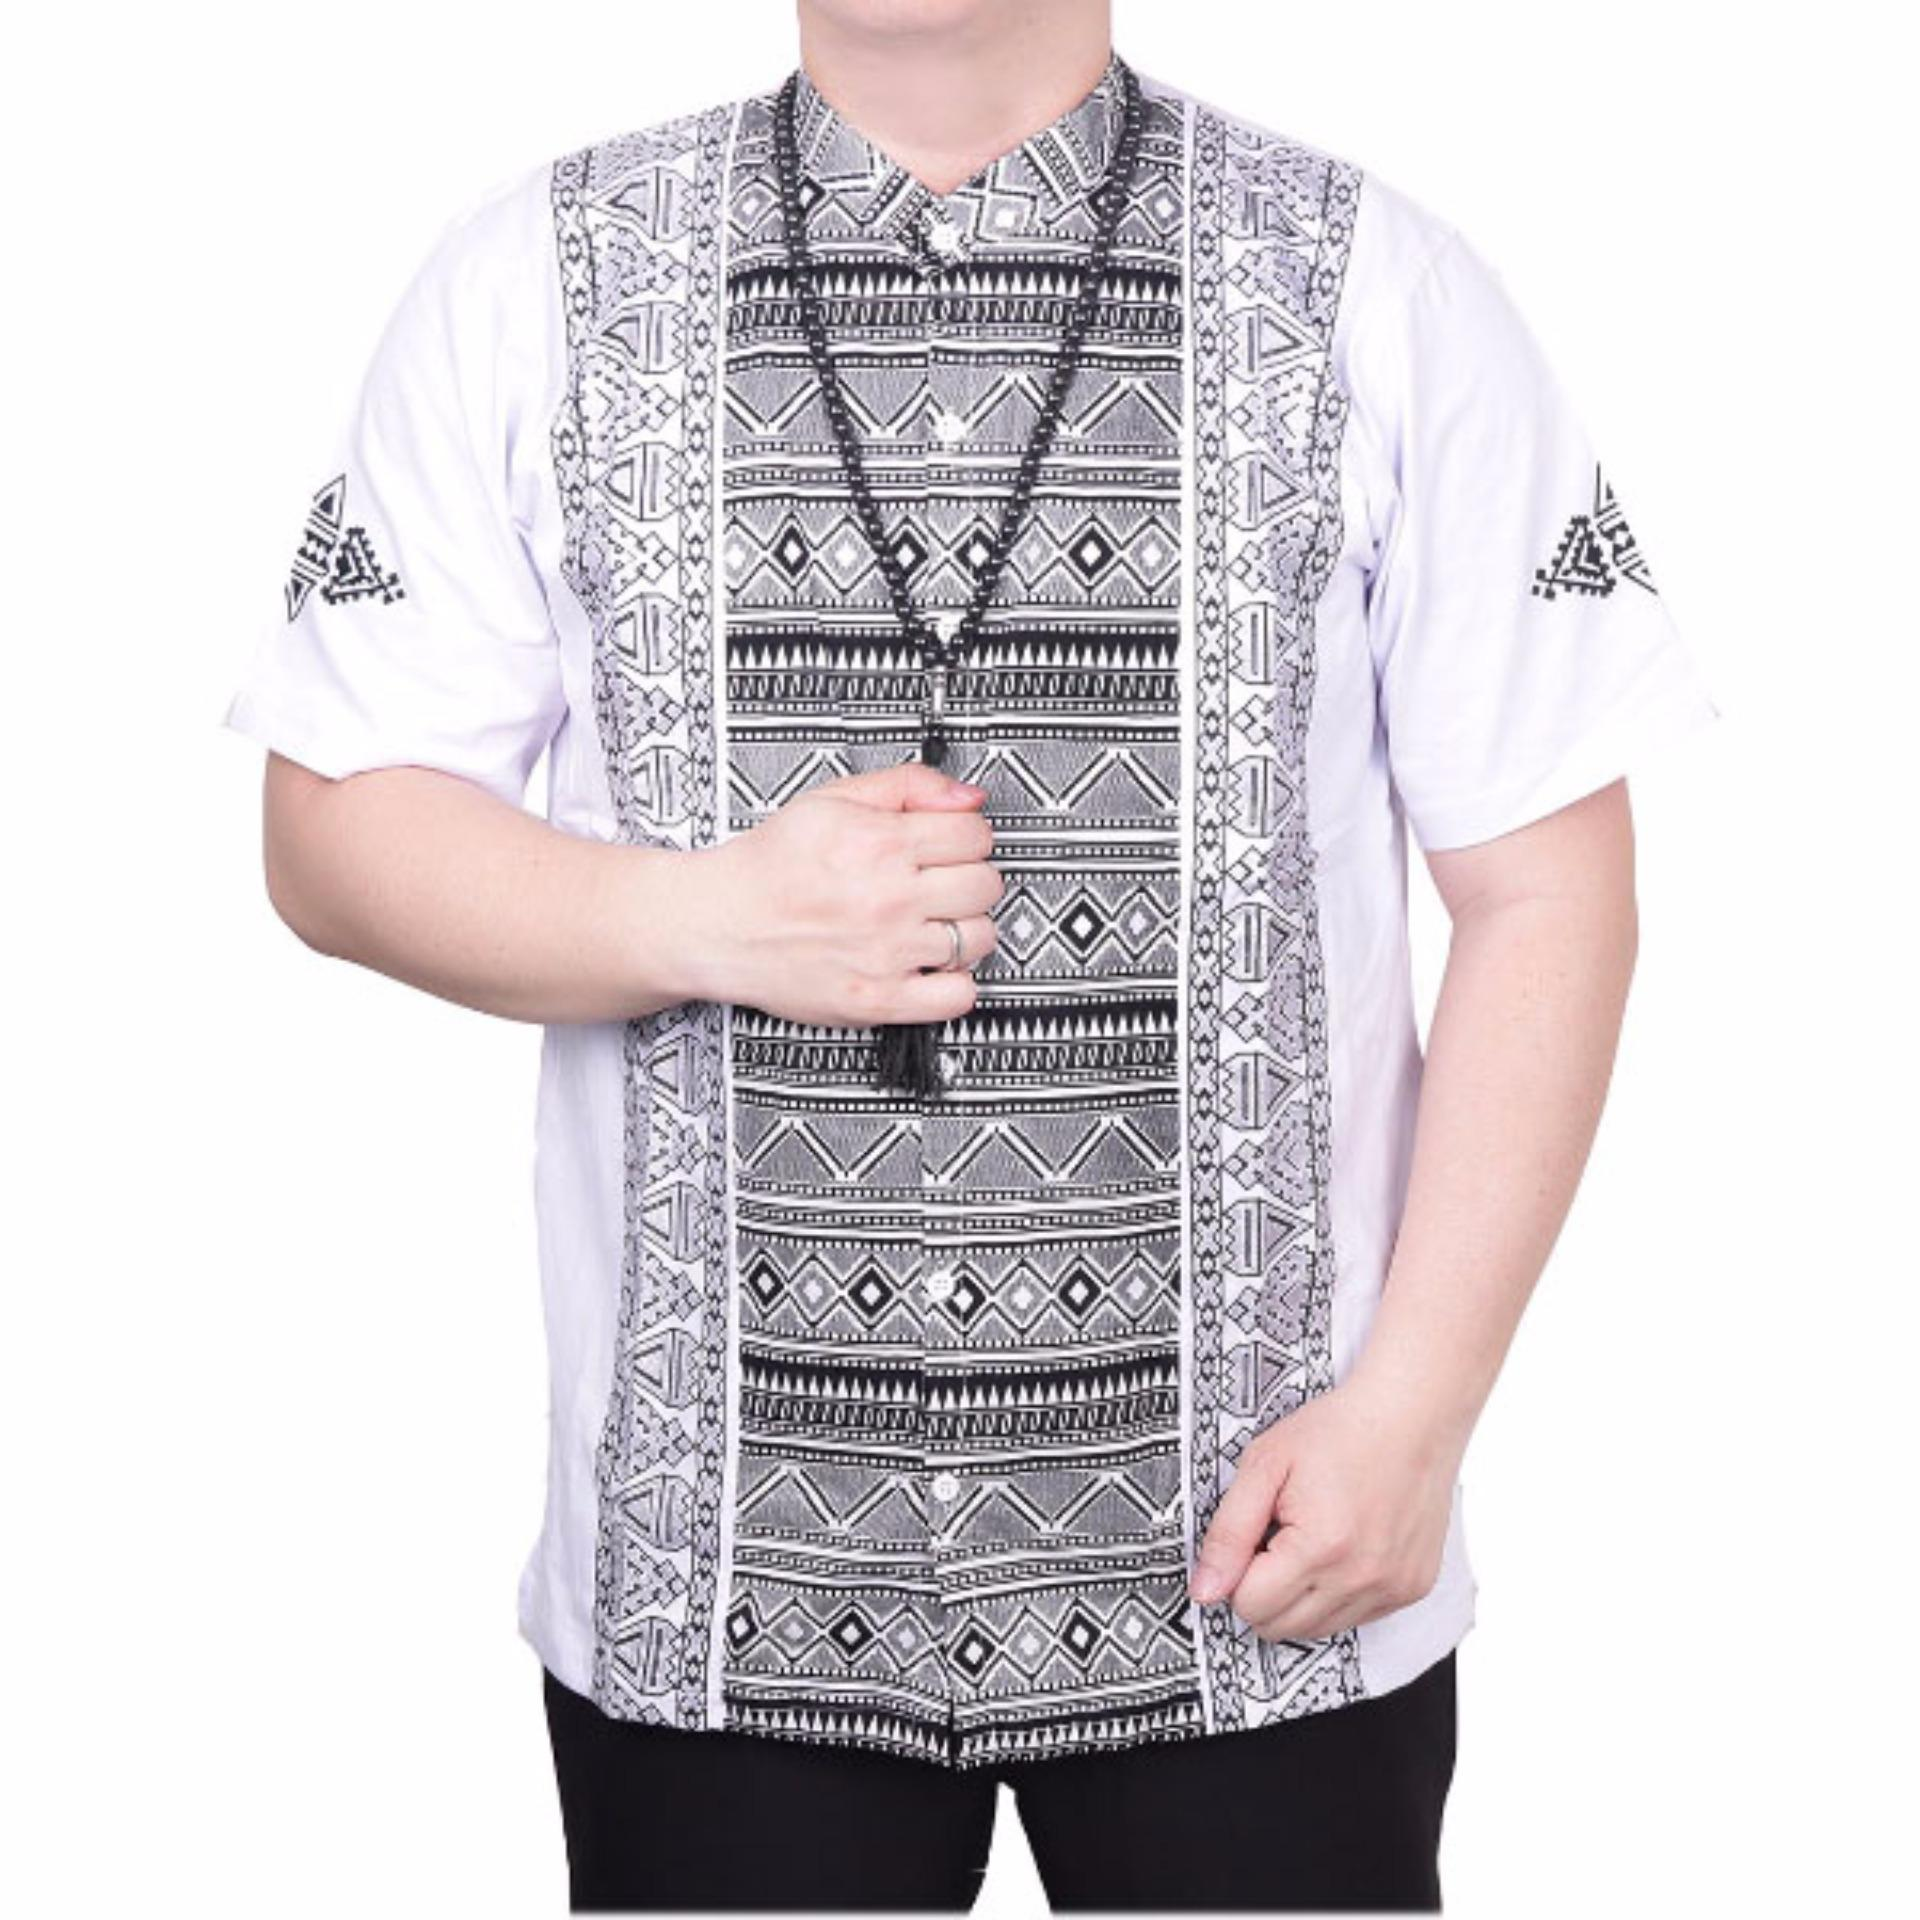 Ormano Baju Koko Muslim Batik Lengan Pendek Lebaran Zo17 Kk30 Kemeja Fashion Pria Putih Ormano Diskon 30